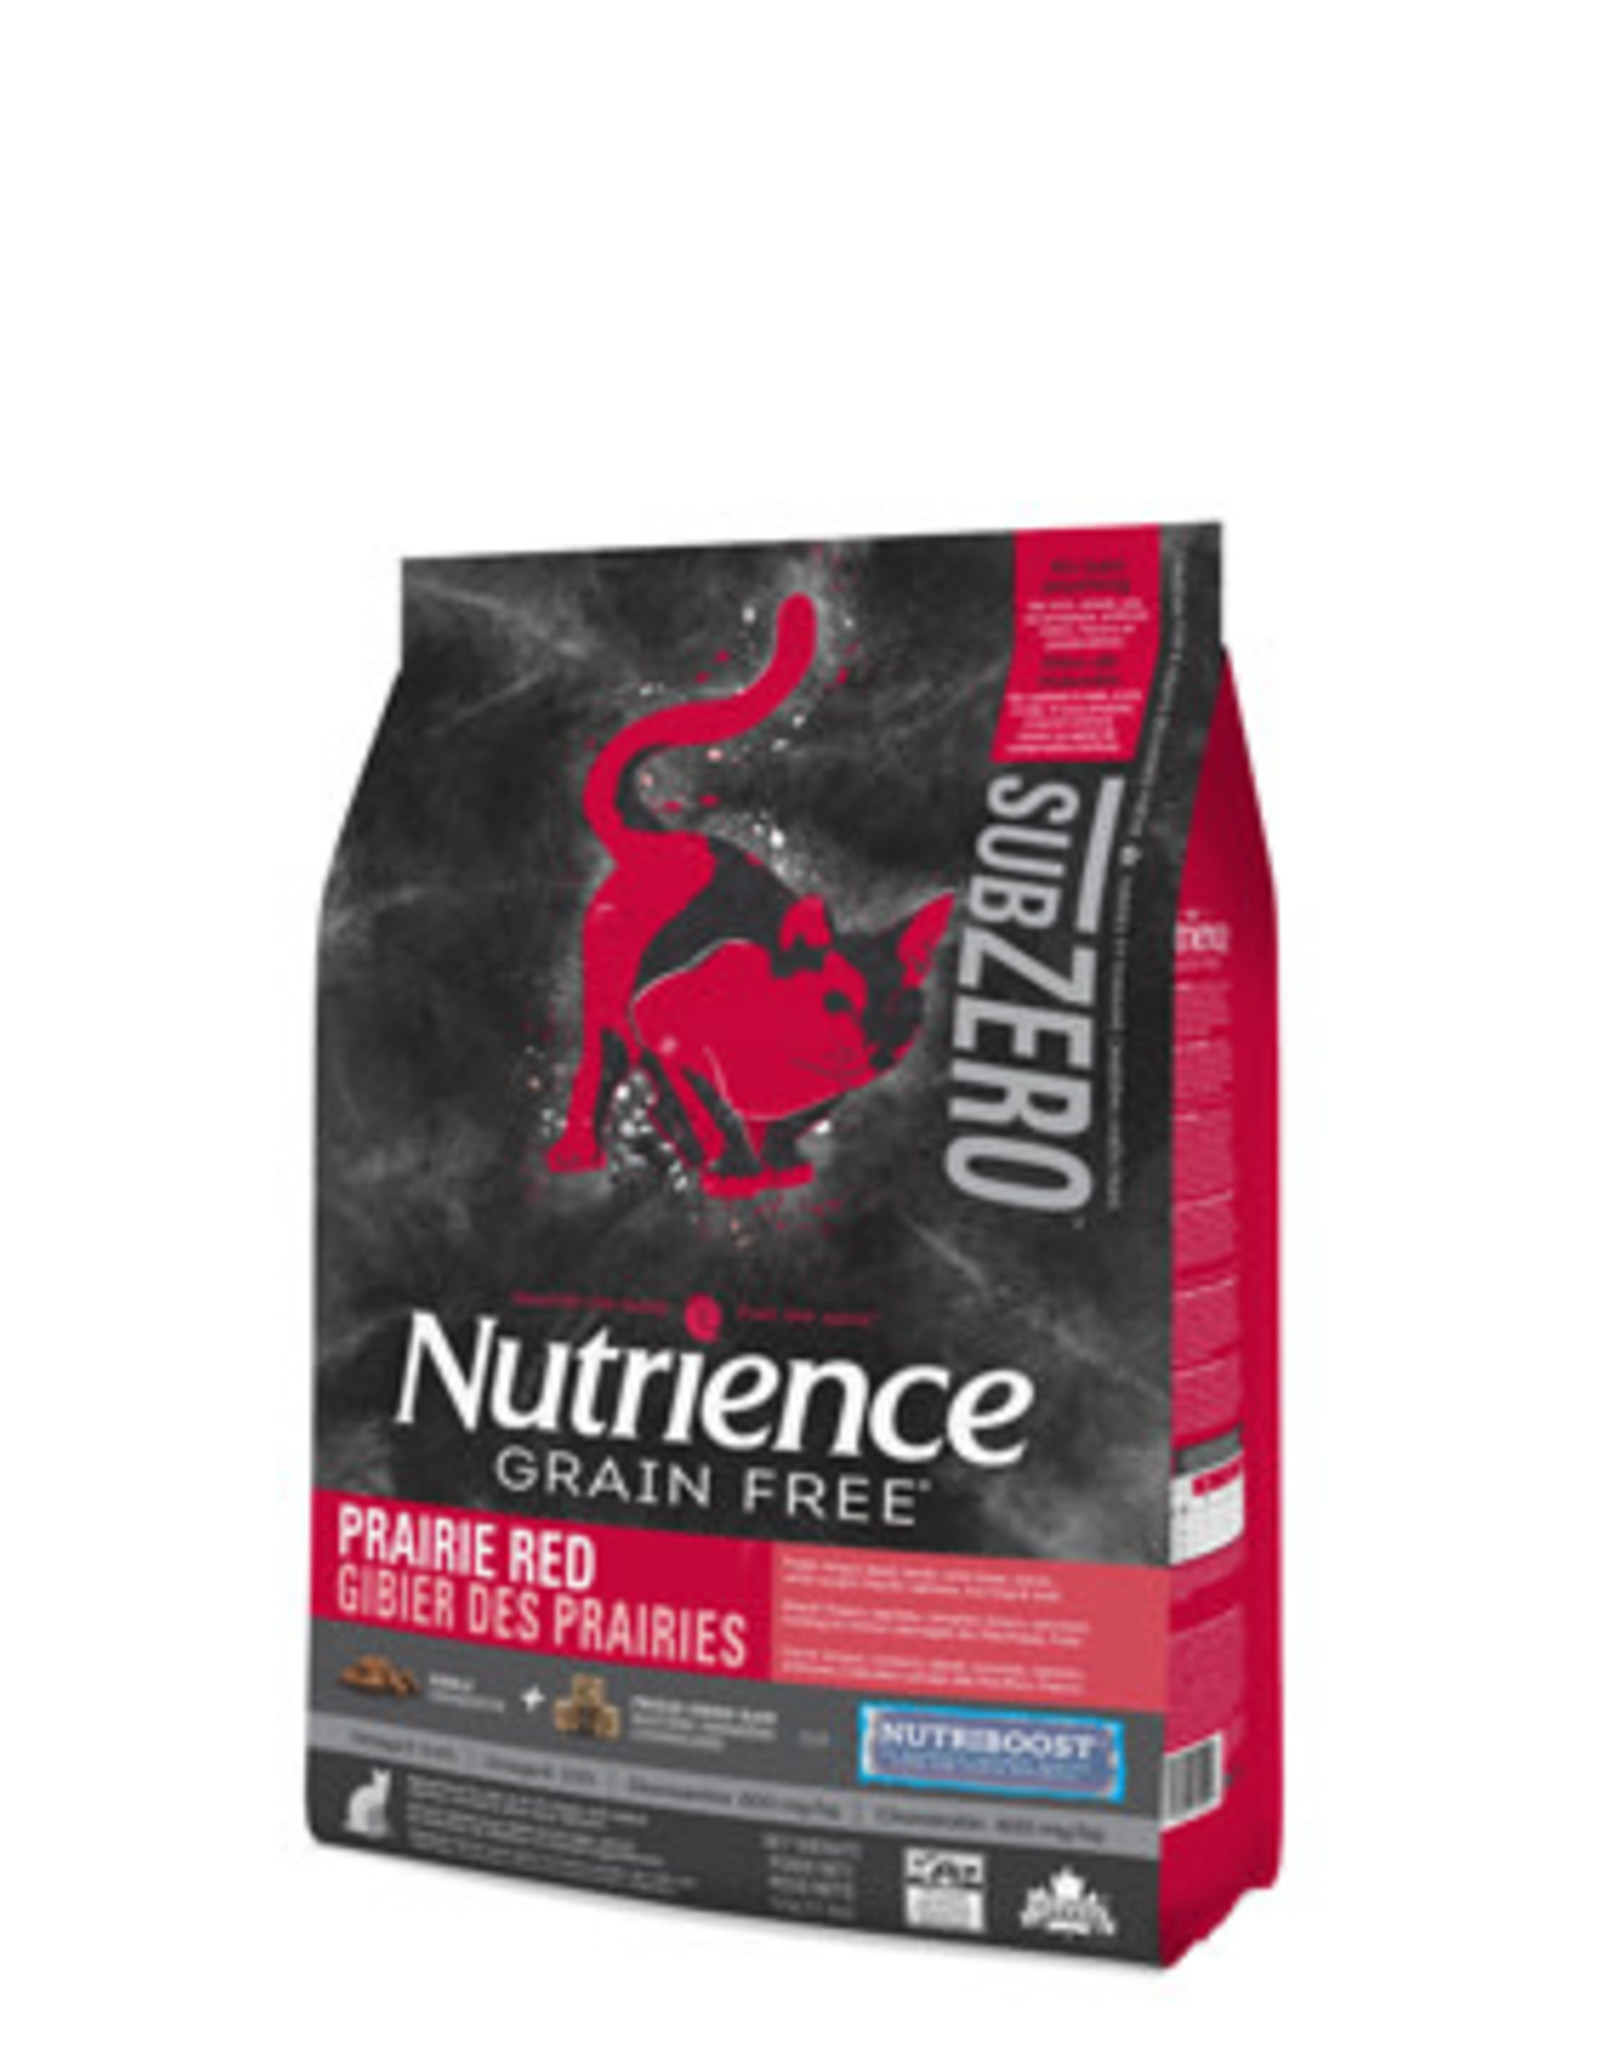 NUTRIENCE Nutrience Grain Free Subzero for Cats - Prairie Red - 5 kg (11 lbs)